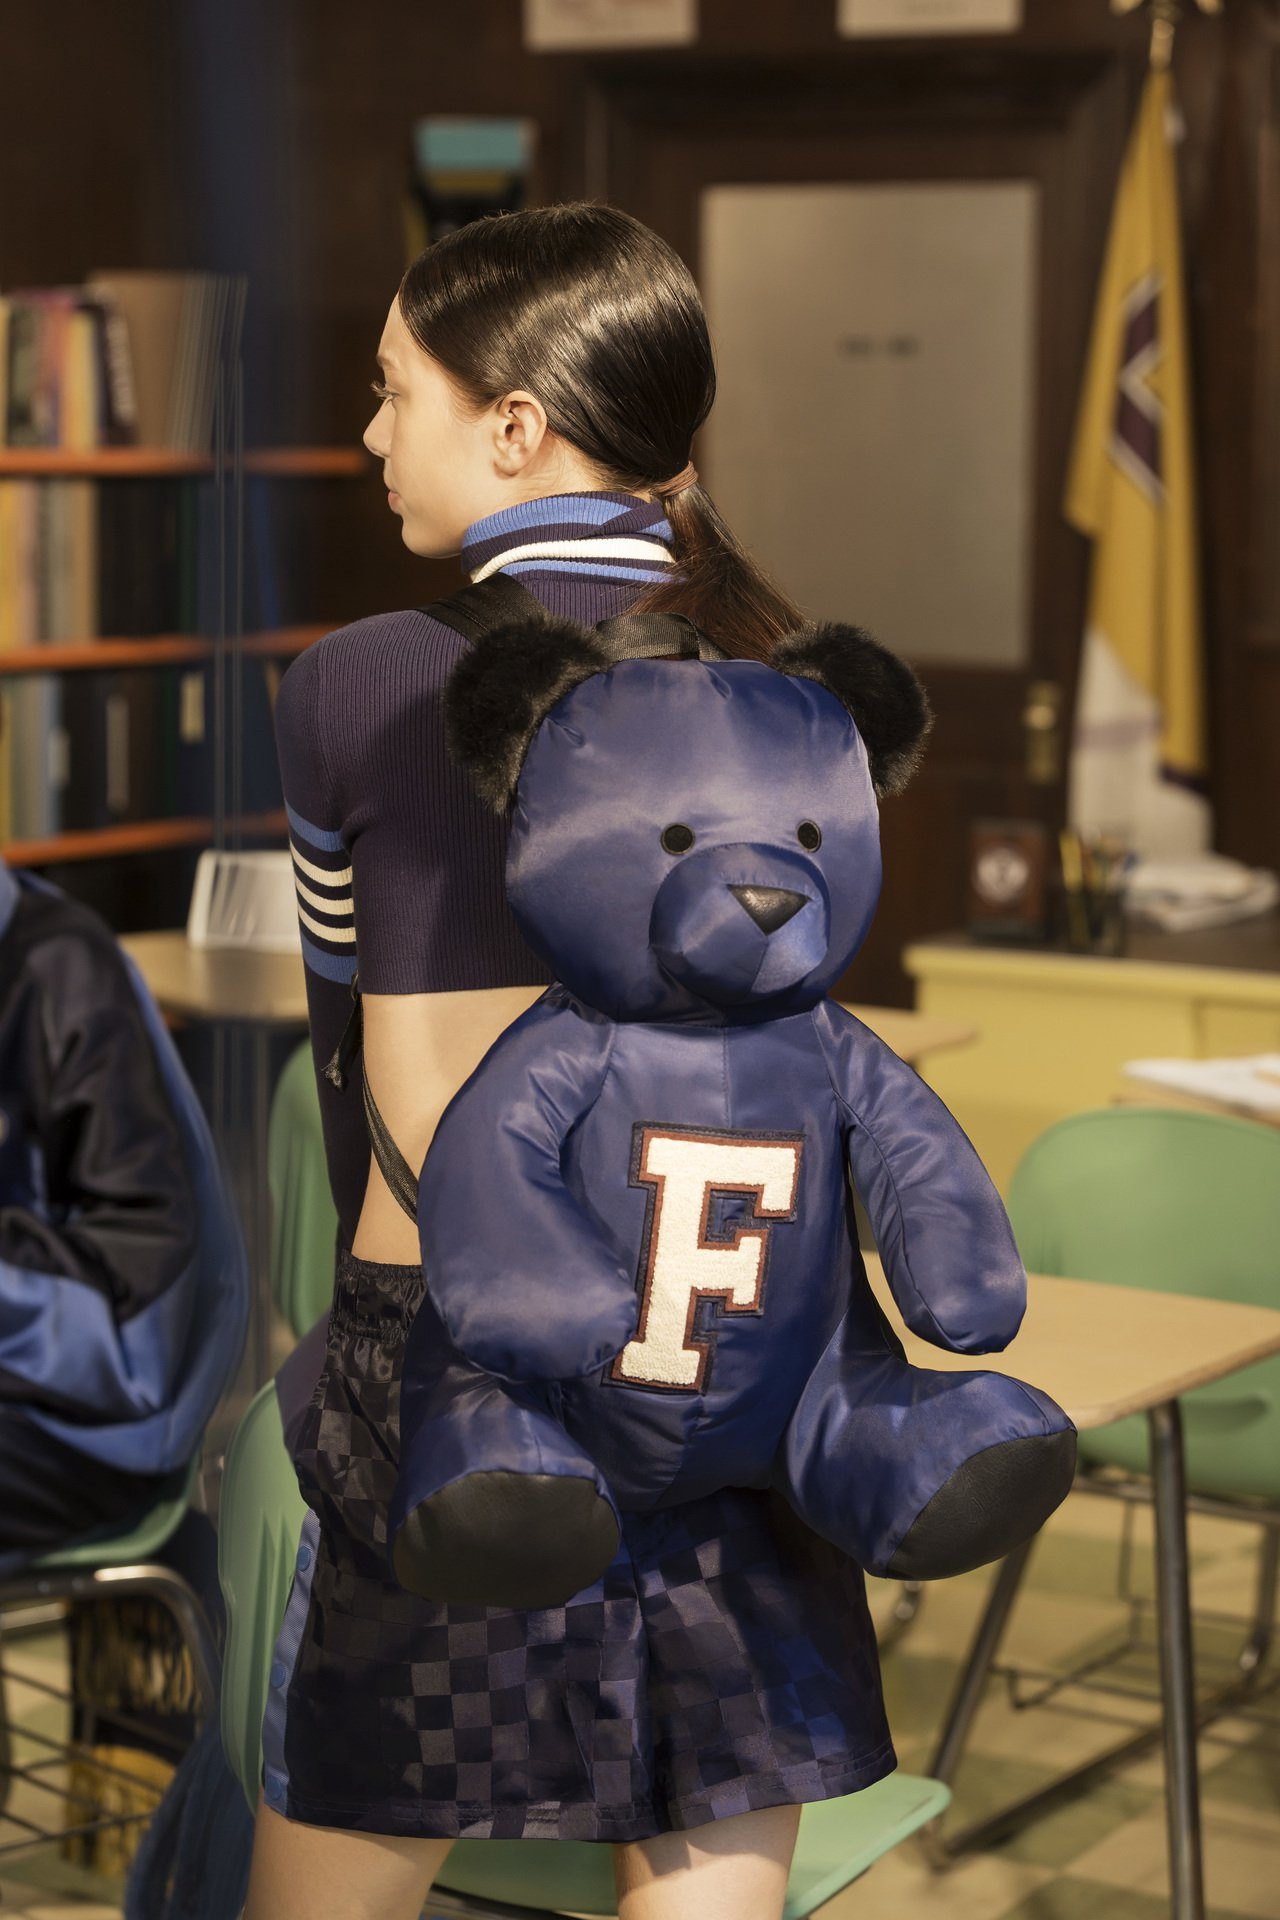 PUMA X FENTY泰迪熊造型後背包6,680元。圖/PUMA提供